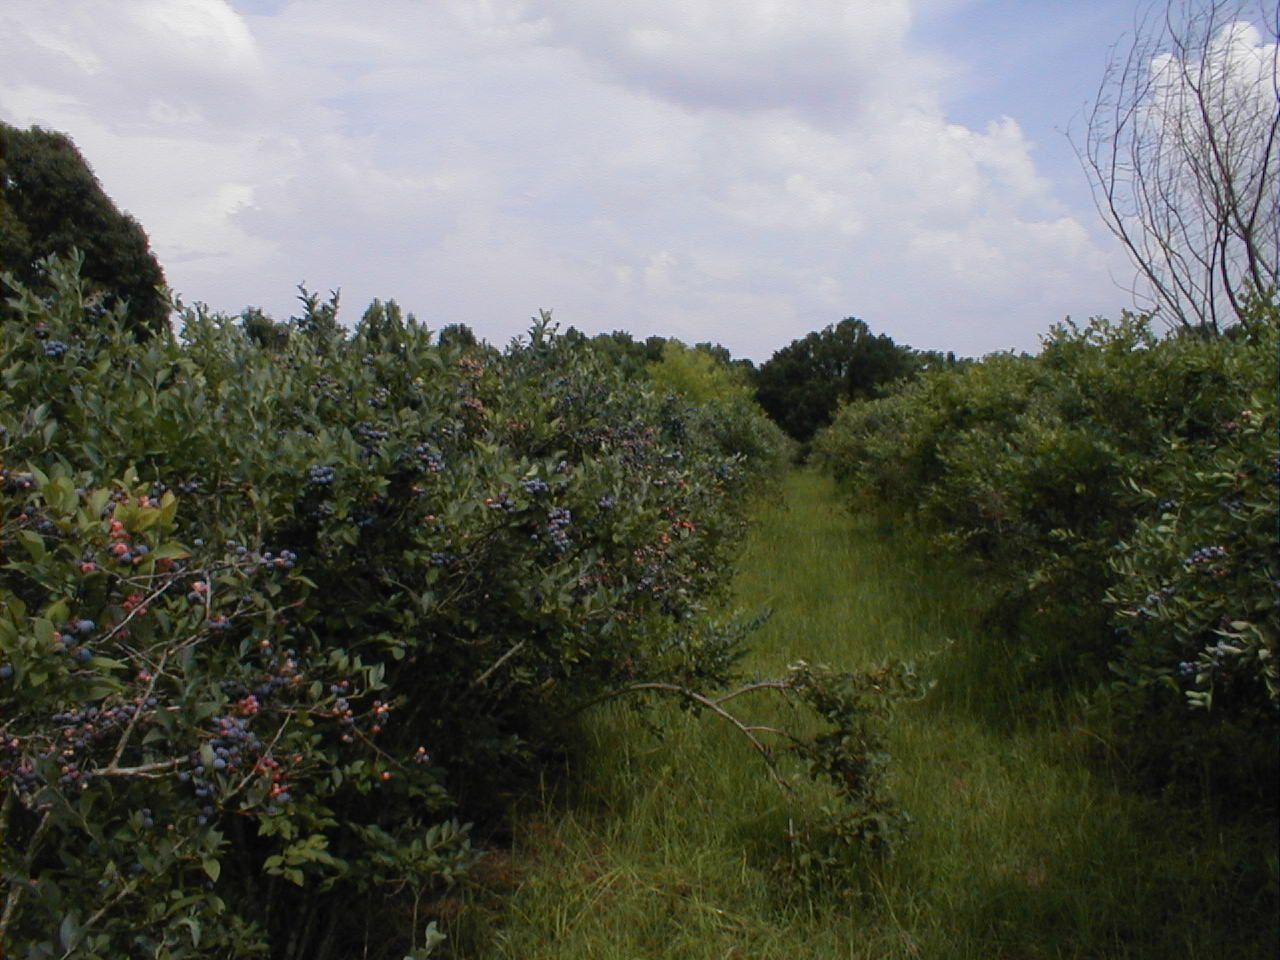 When to prune blueberries  blueberry kinds  Zone b garden  Pinterest  Blueberry Blueberry